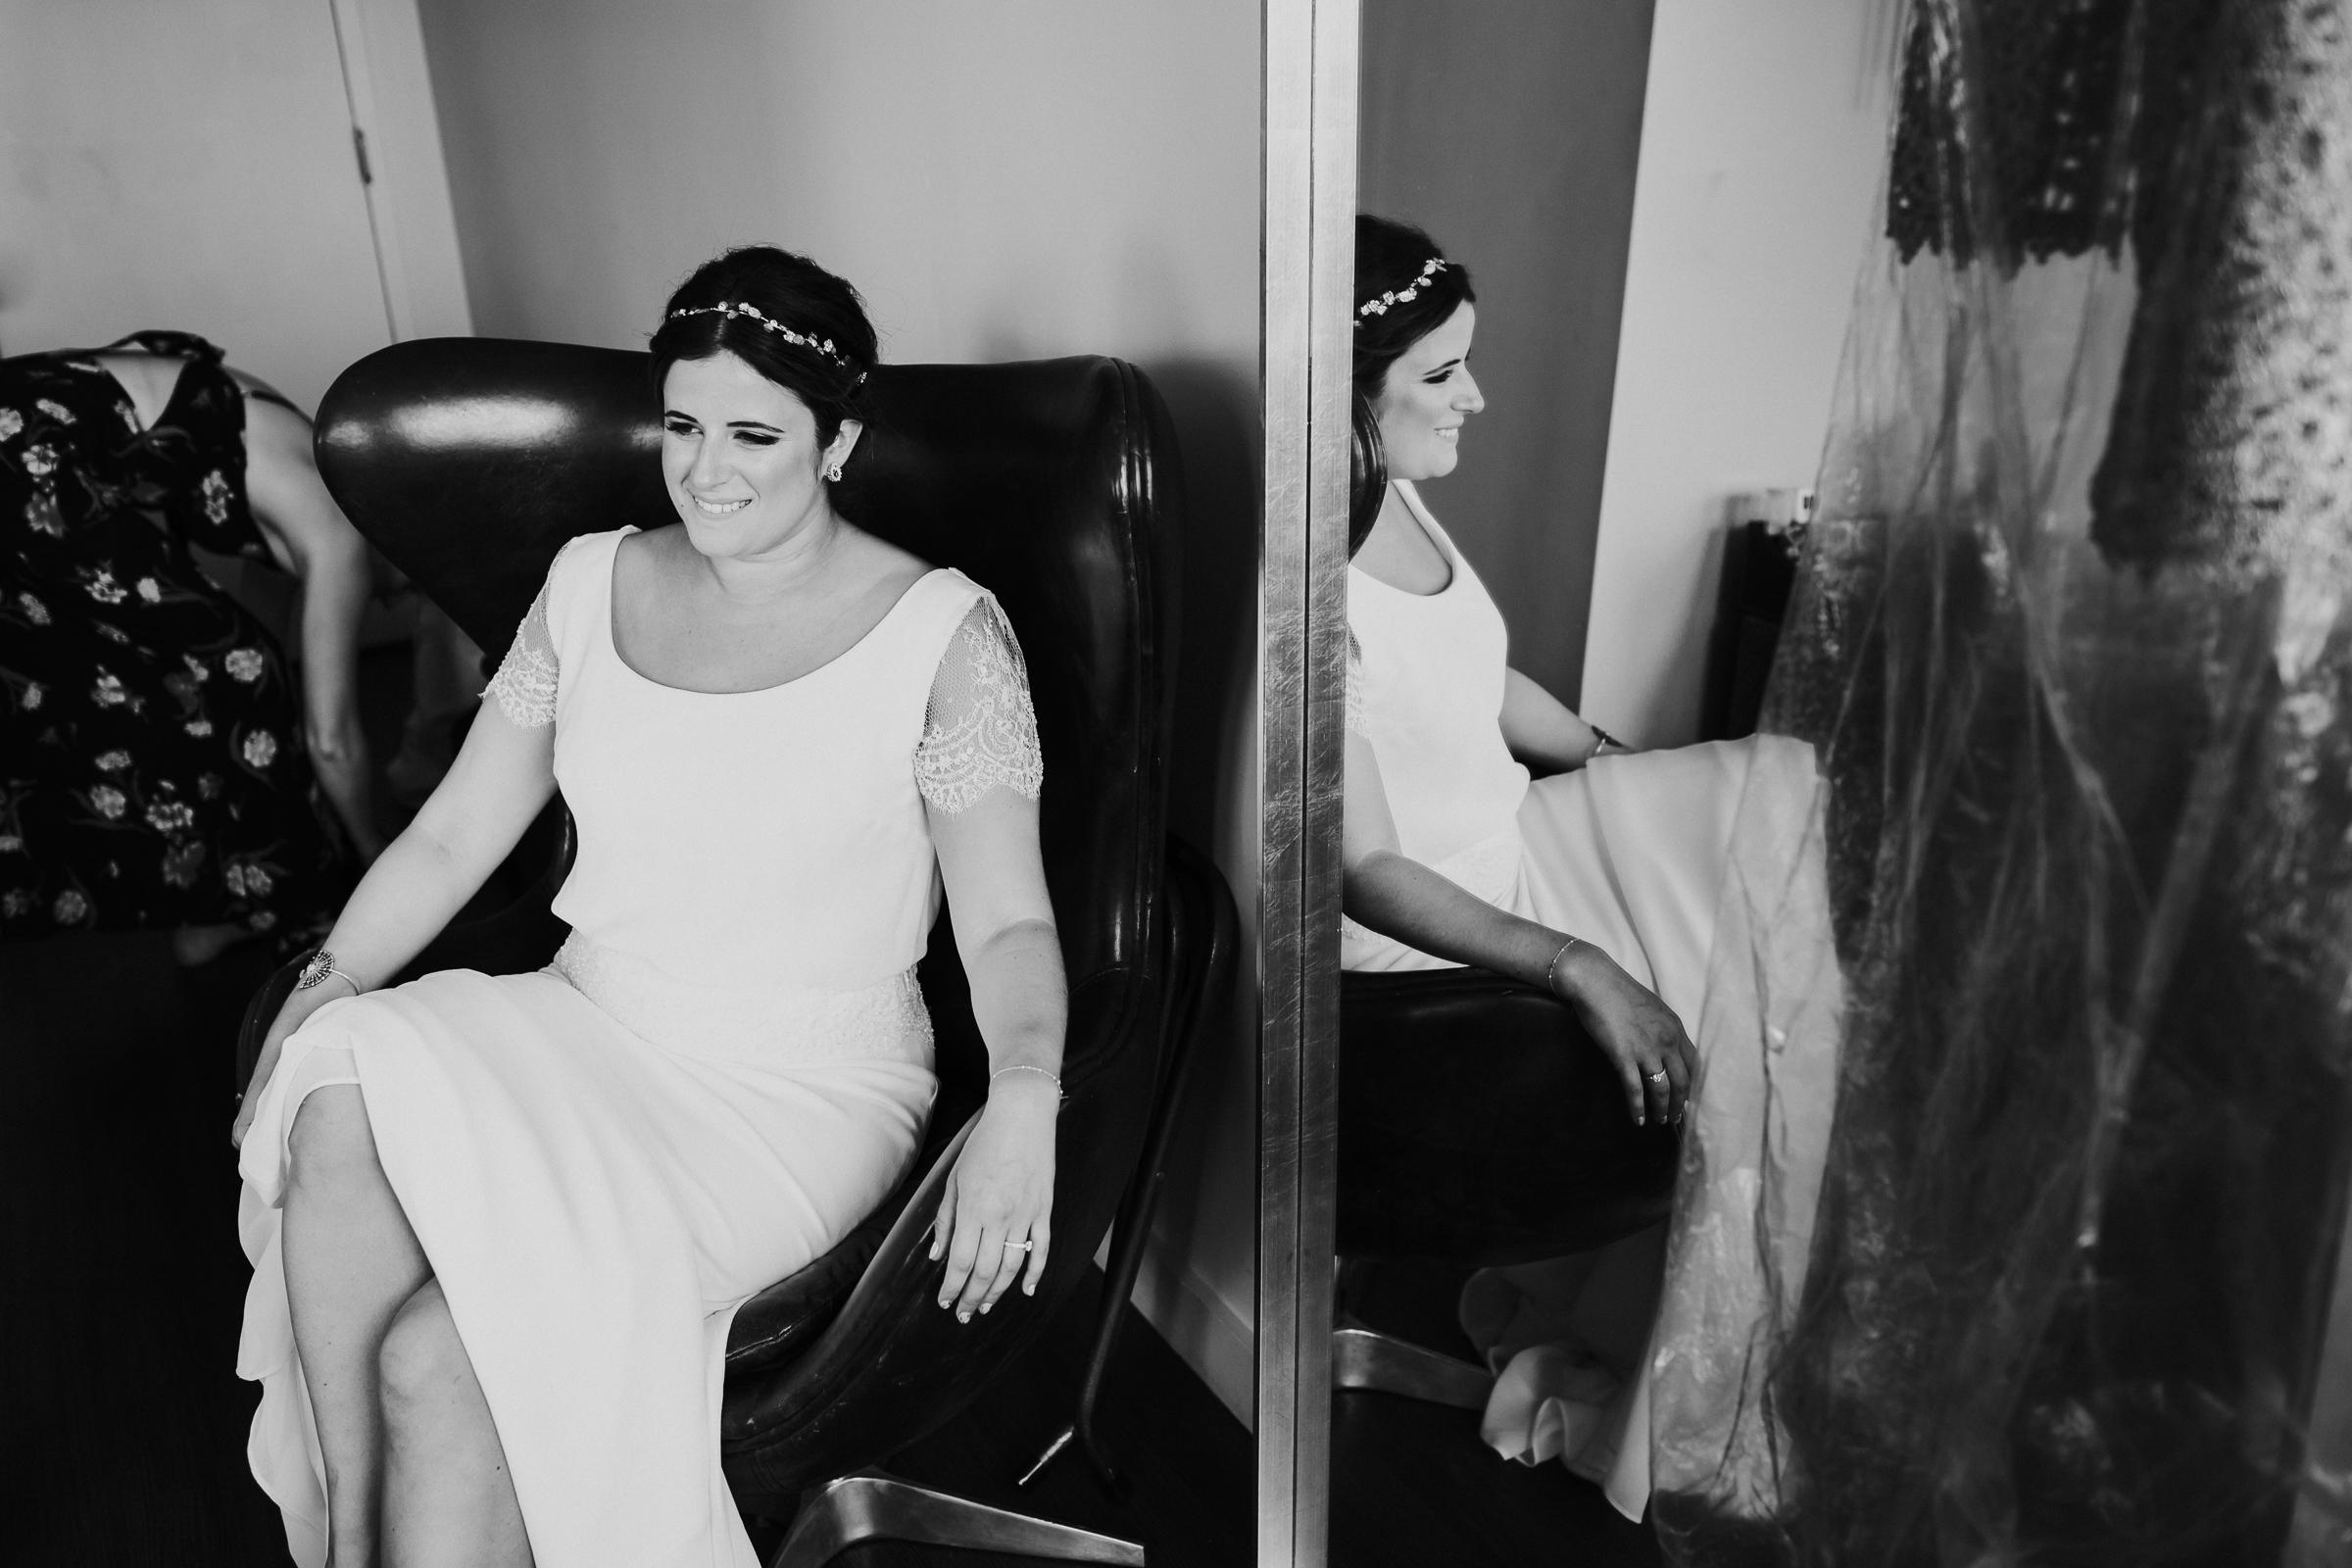 501-Union-Brooklyn-Fine-Art-Documentary-Wedding-Photographer-18.jpg